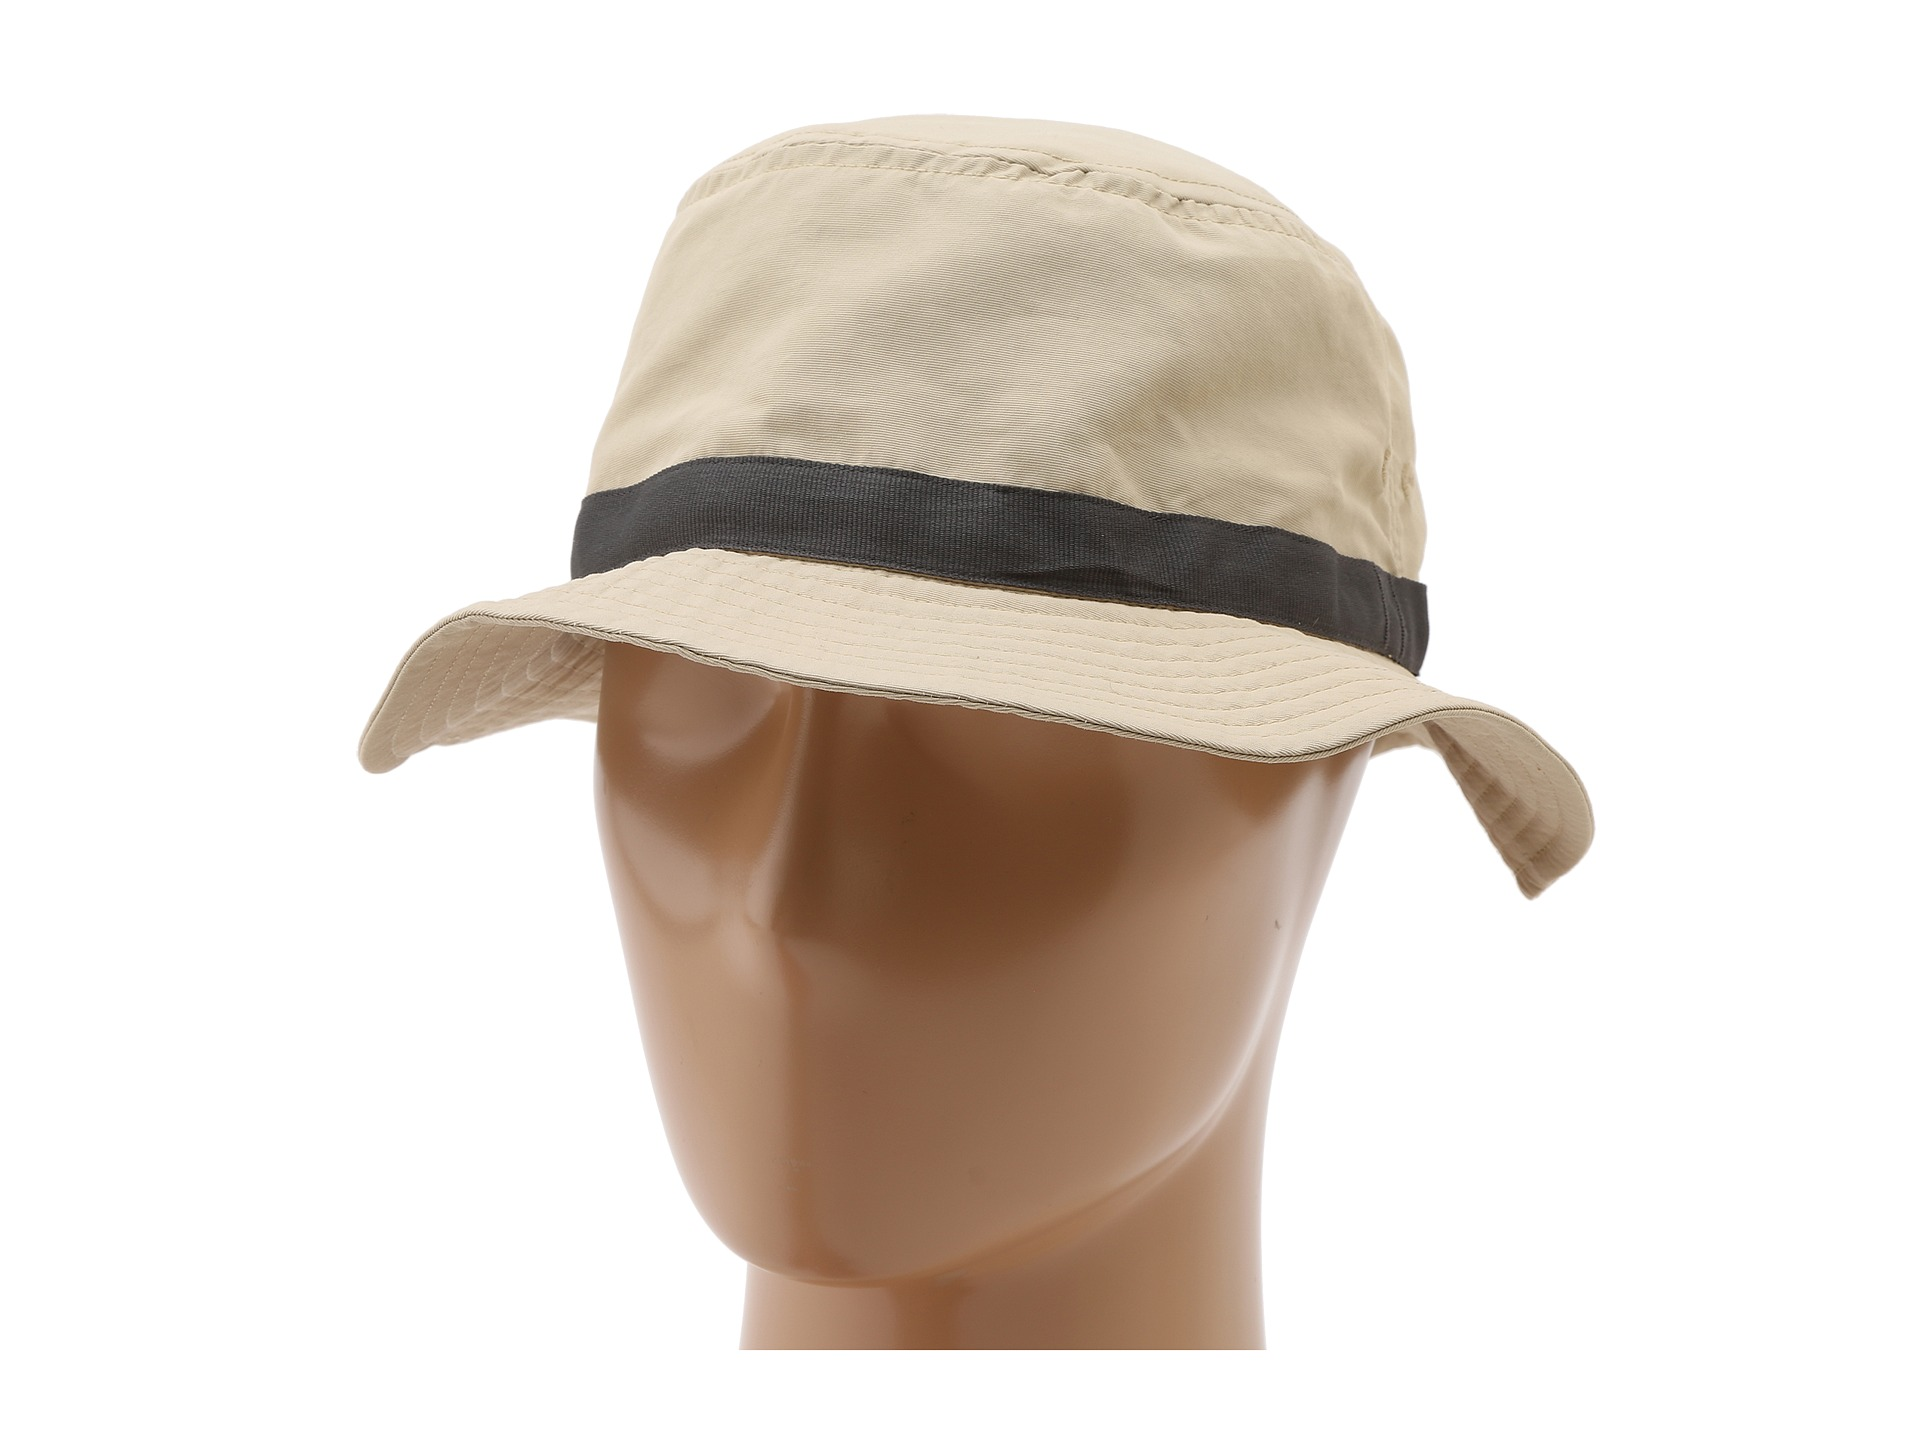 b6e4a67c0e5 patagonia bucket hat